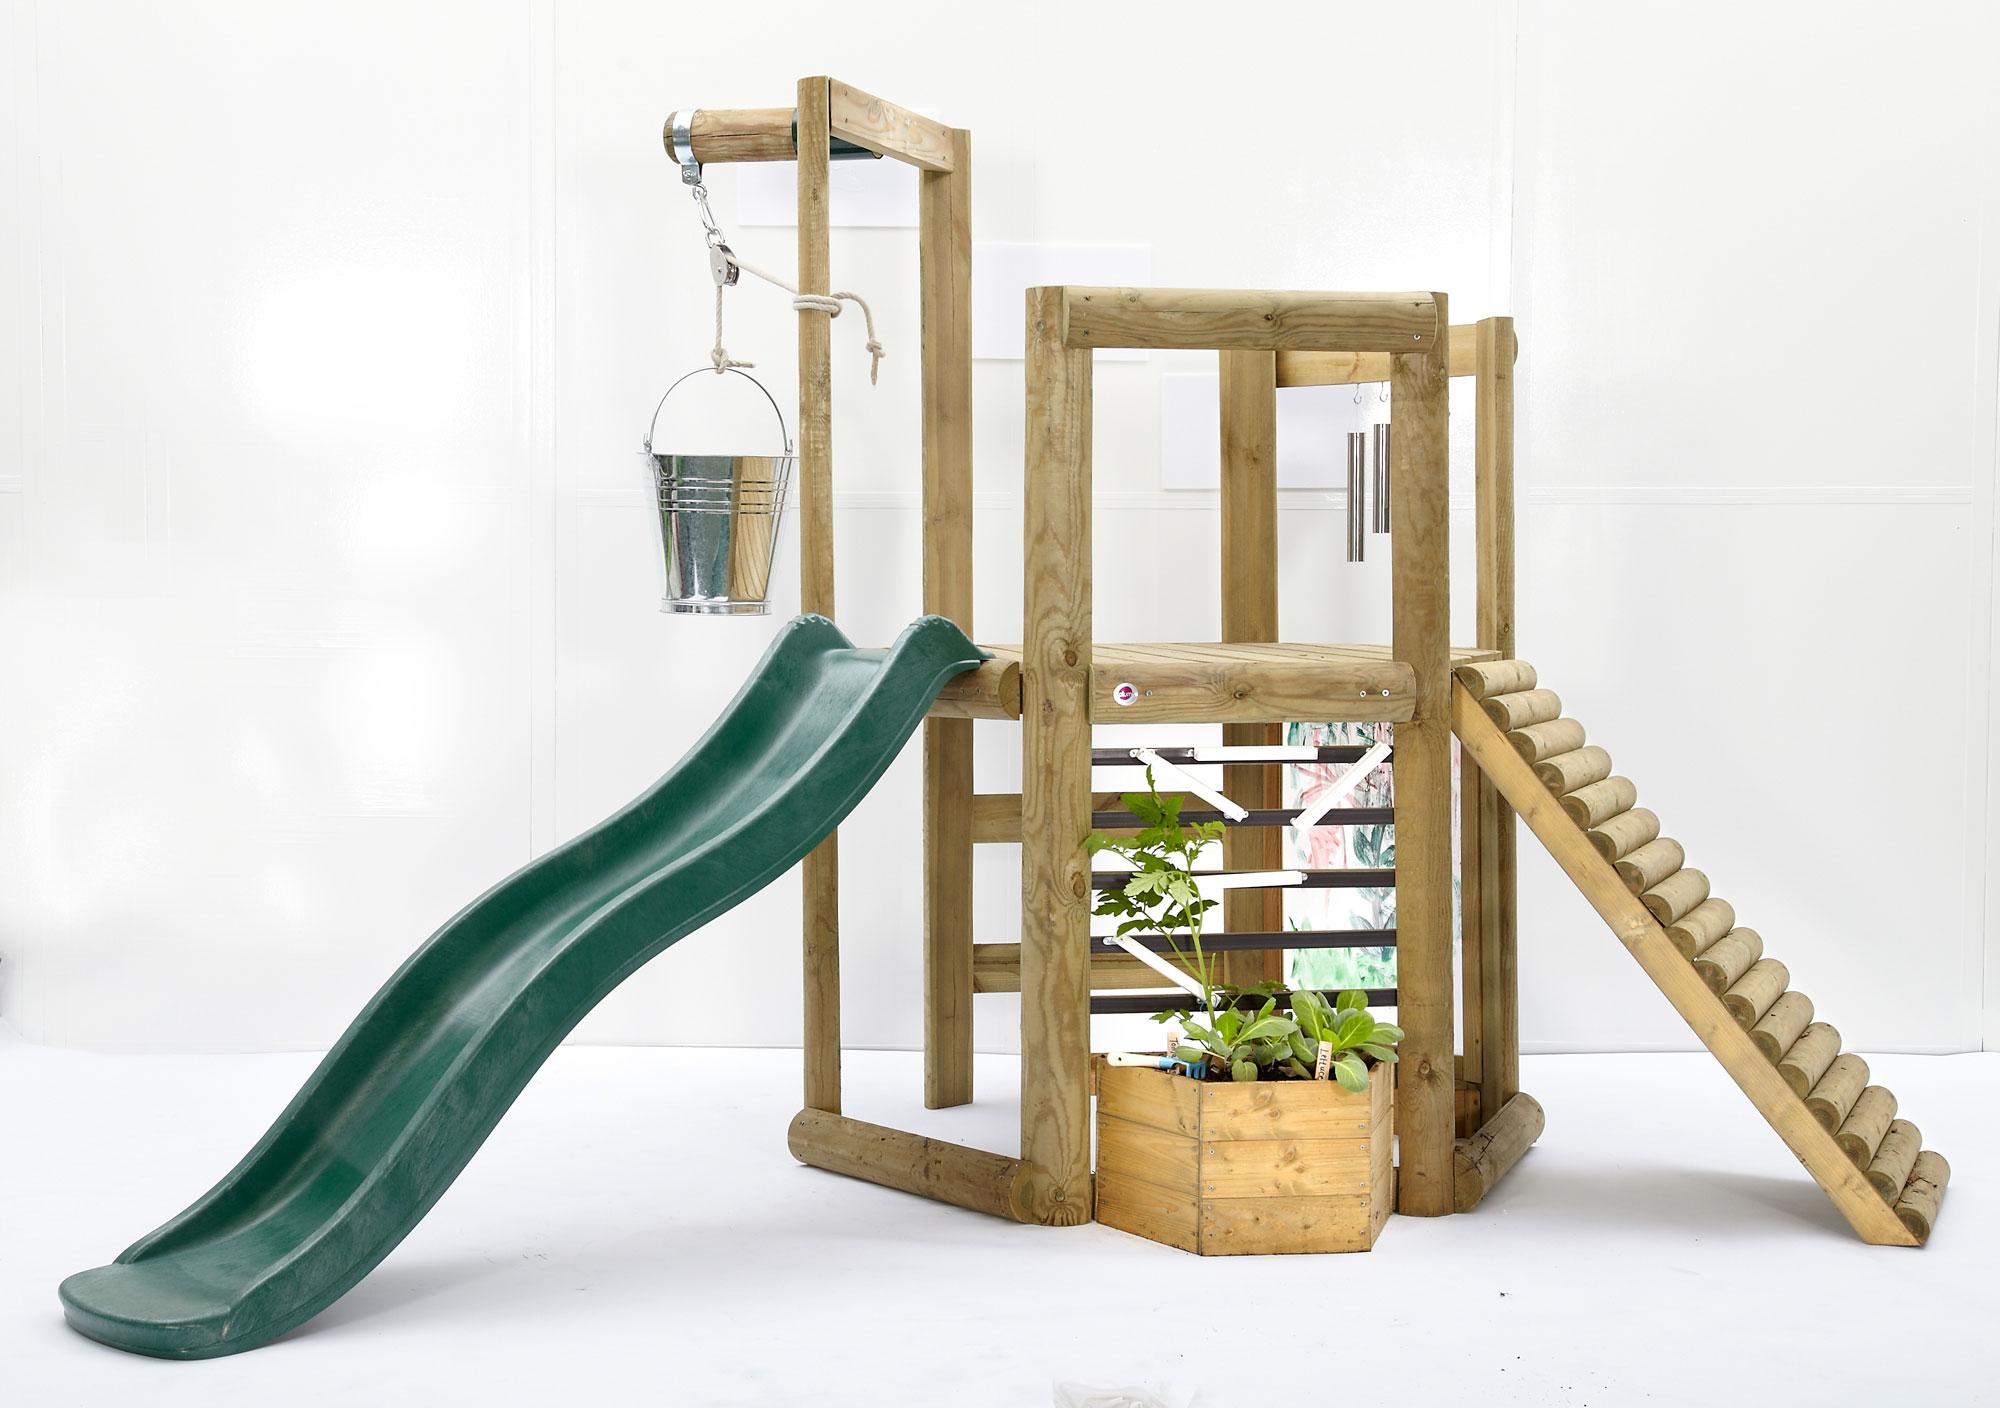 Spielturm Plum Discovery Spielhaus Holz 270x240x193cm Bild 1